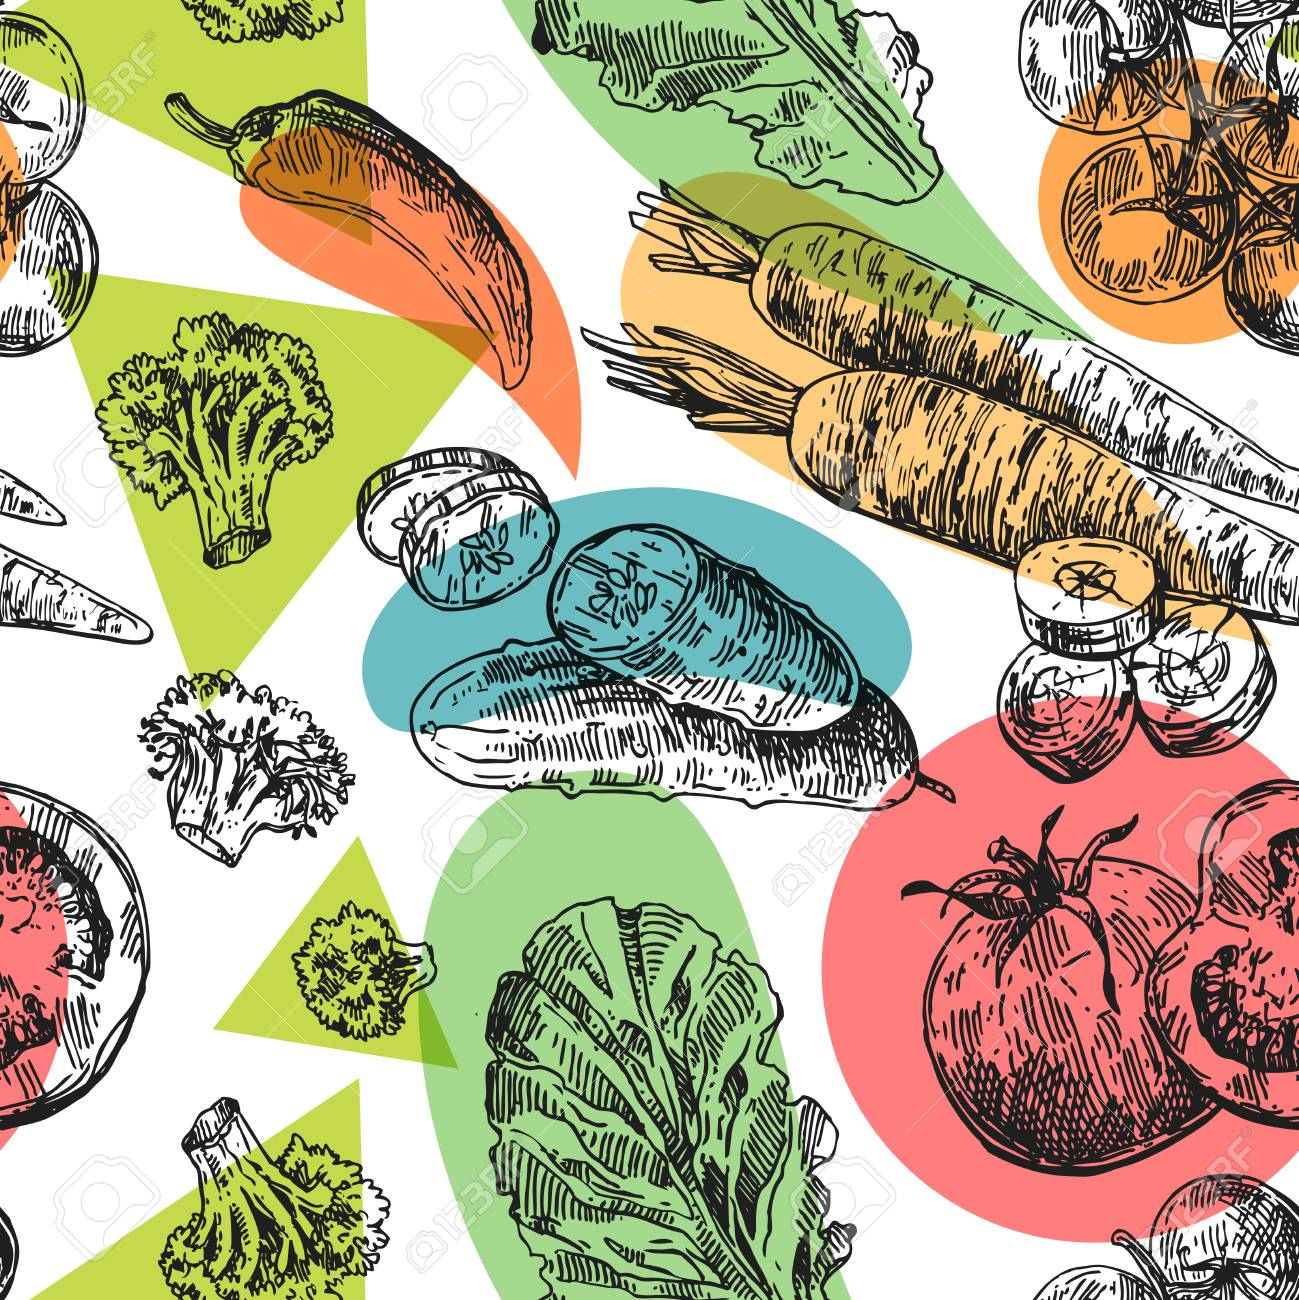 Beautiful hand drawn illustration vegetable. Stock Vector - 92641085